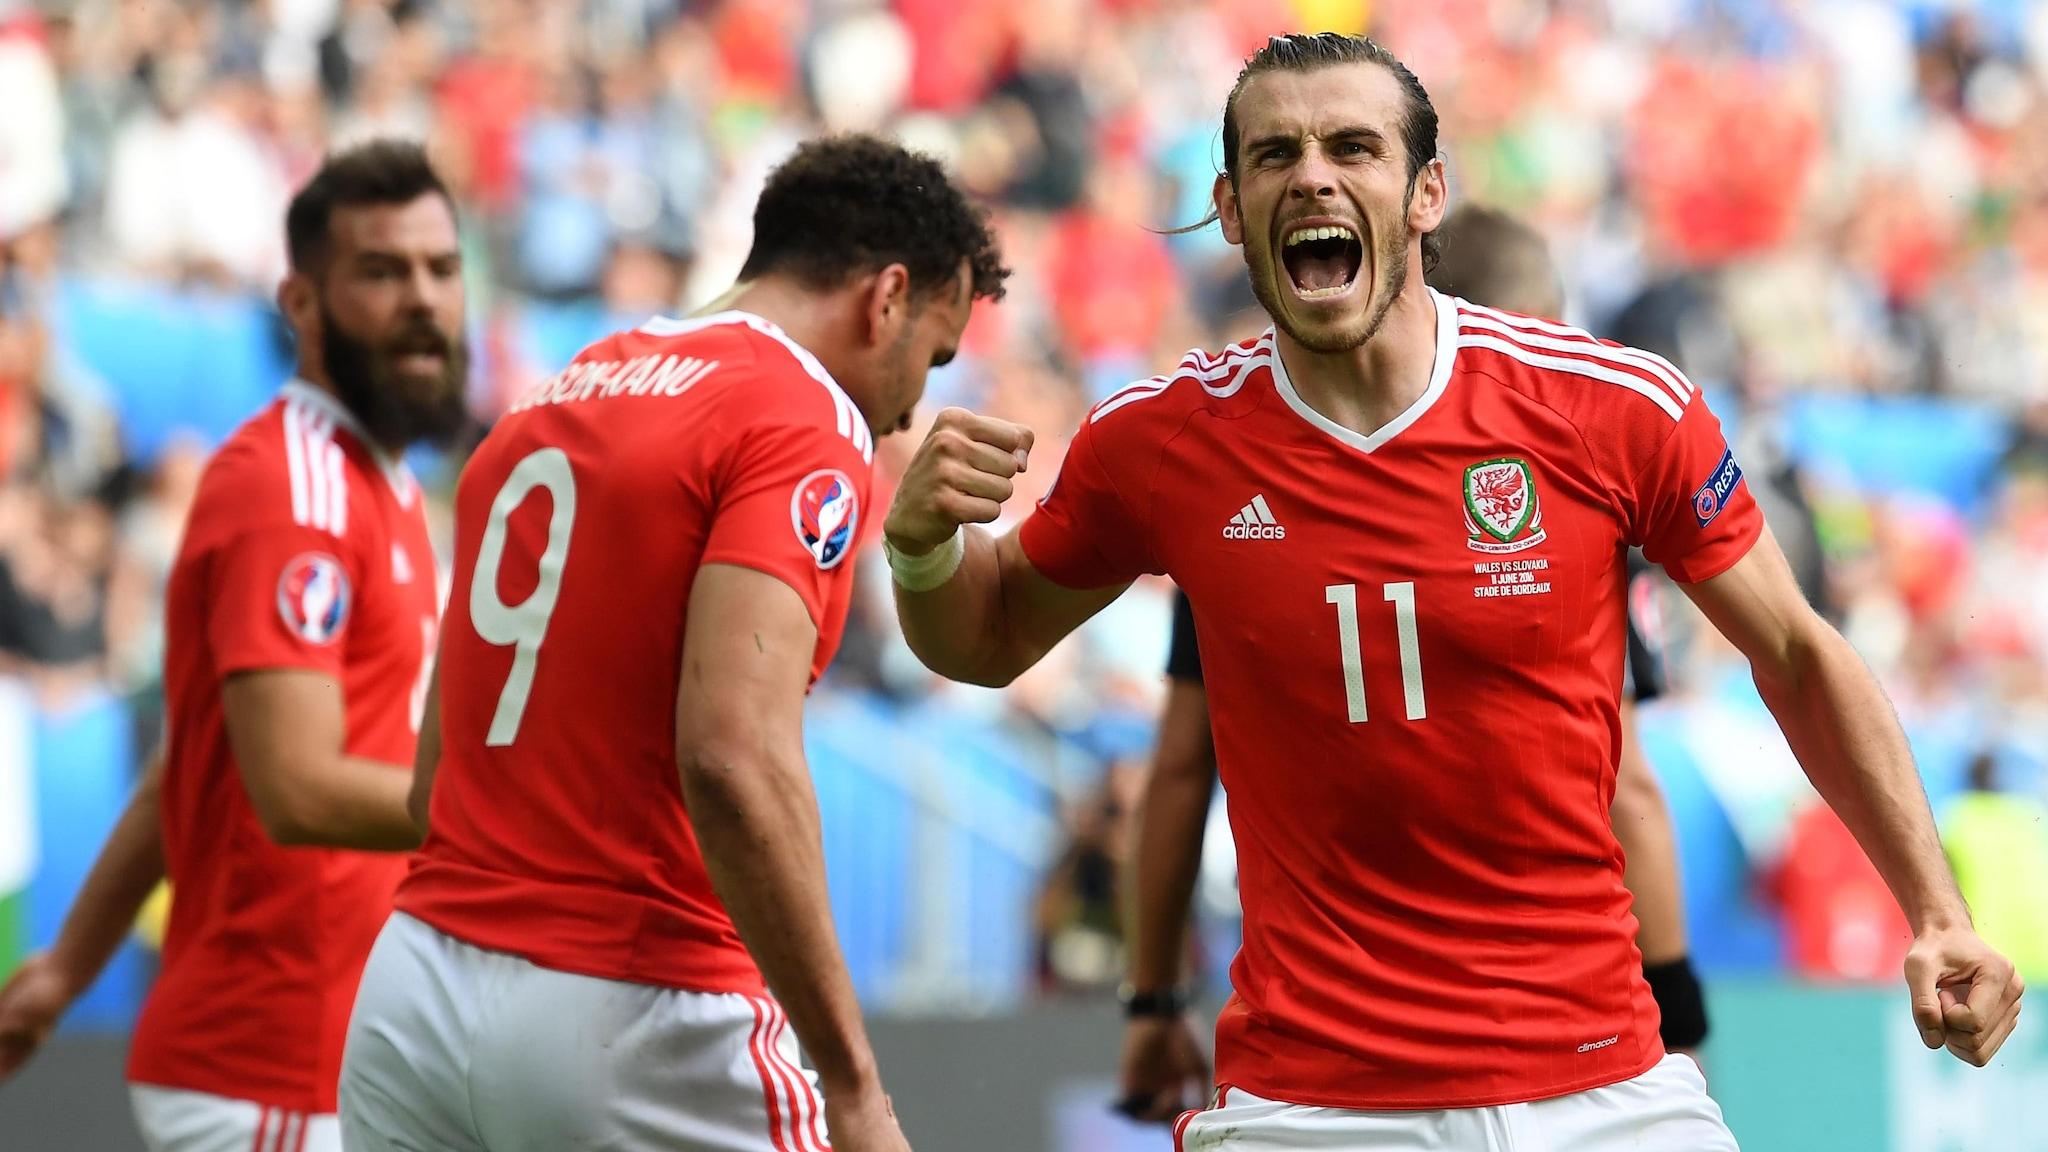 imtahan: uefa avro 2016